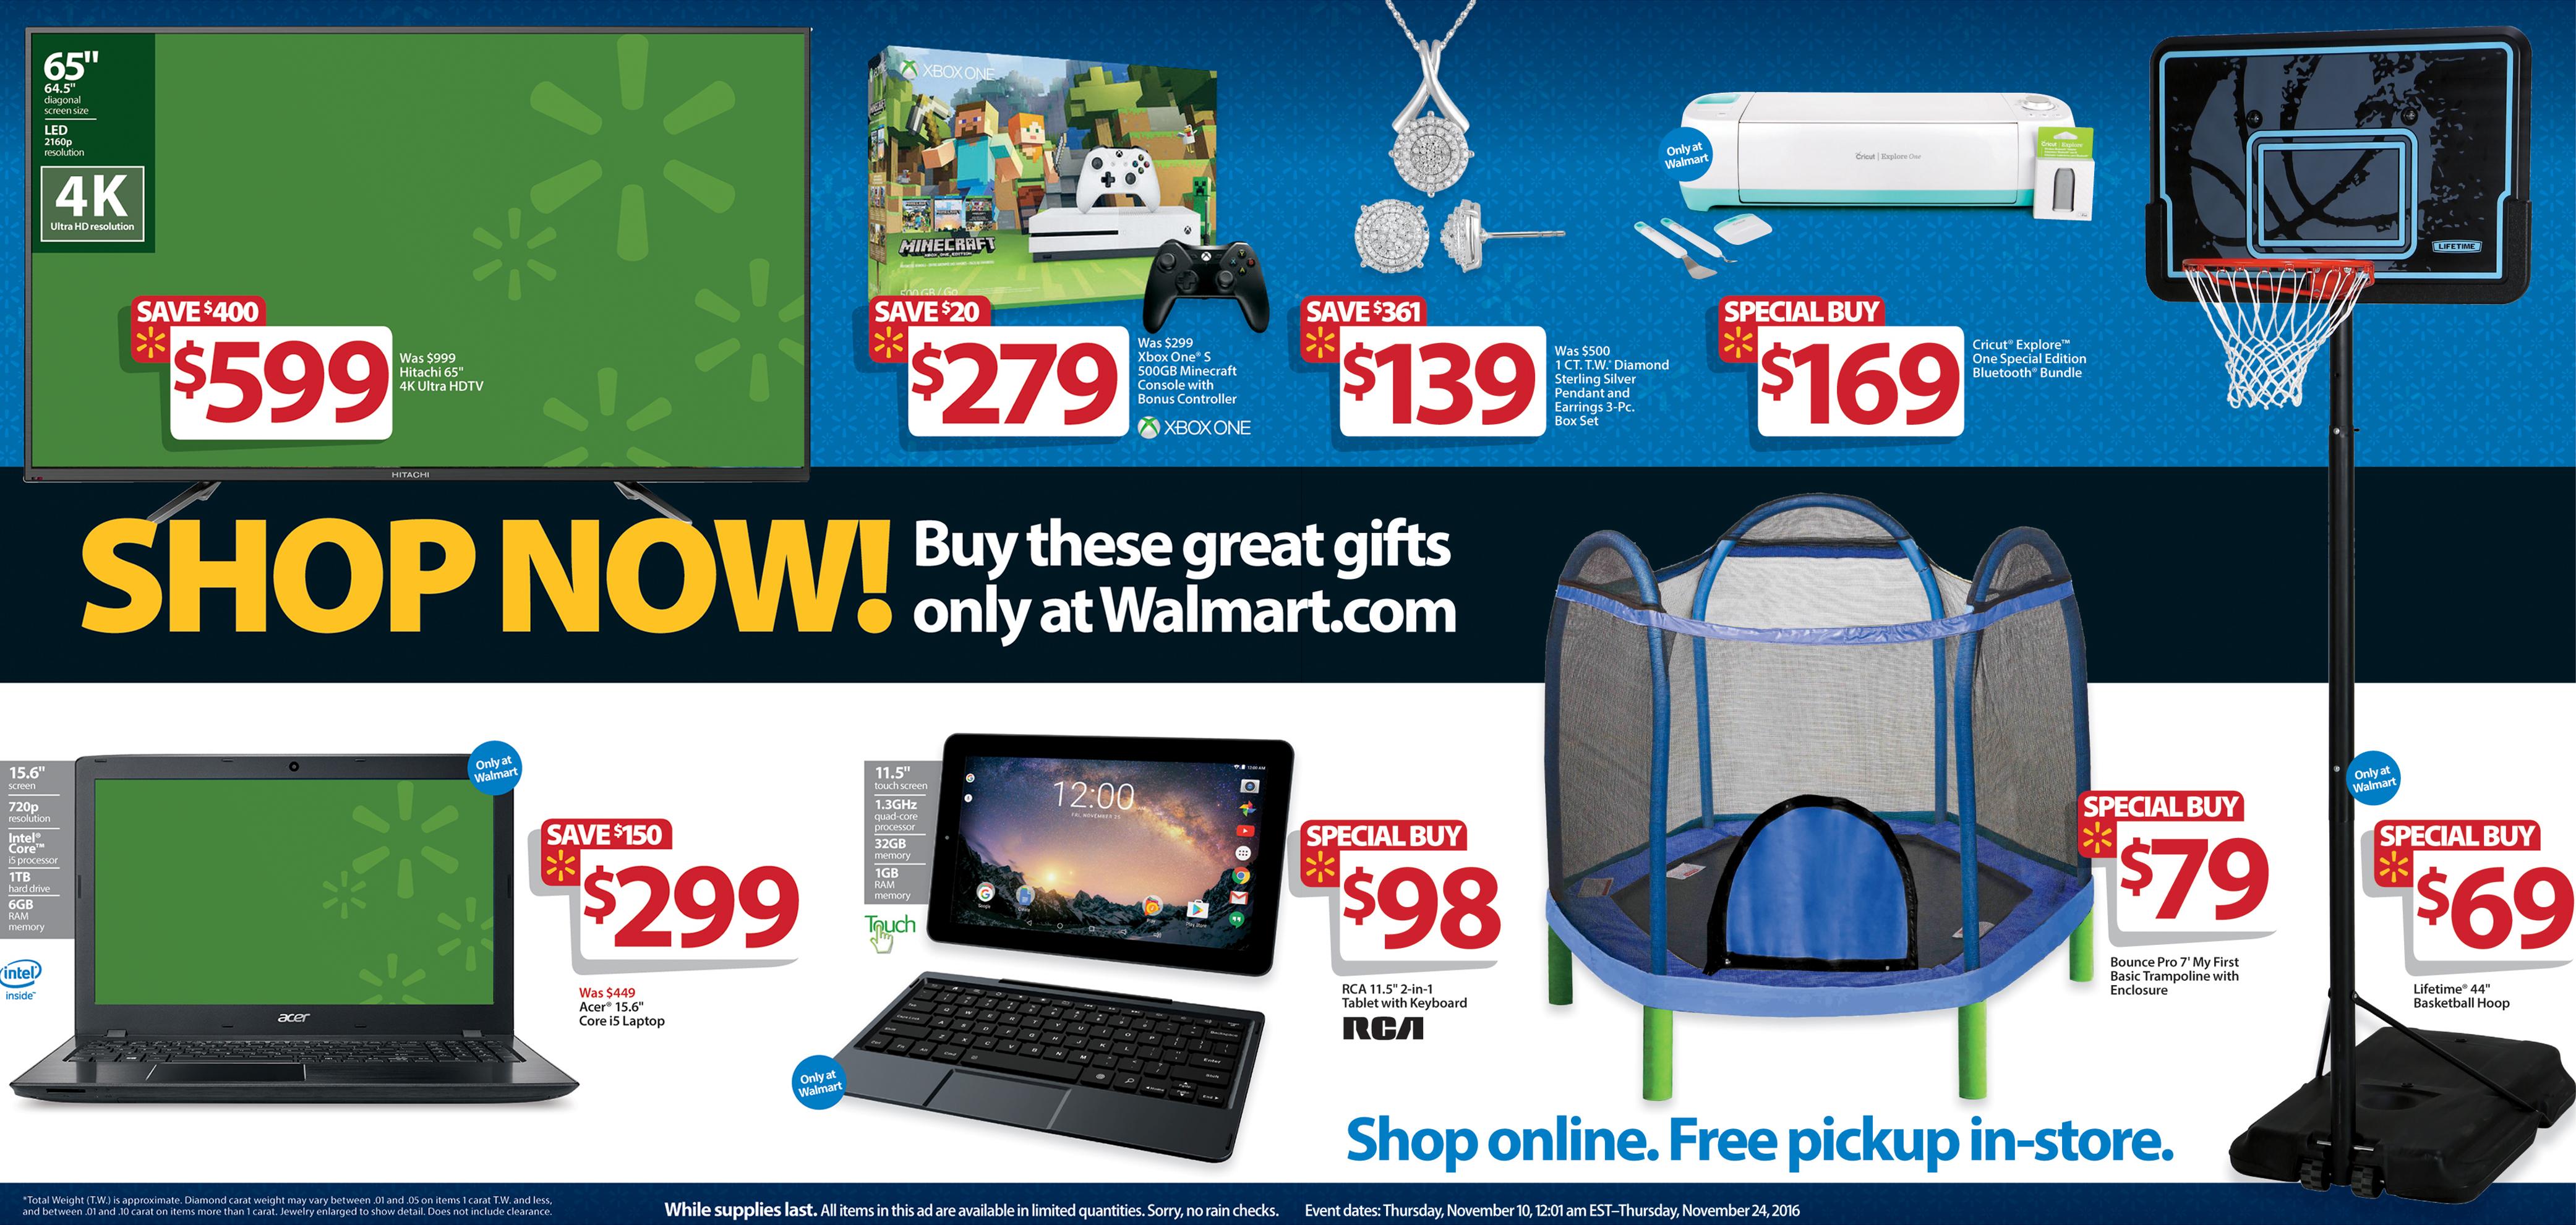 Walmart Unveils Black Friday 2016 Plans – Great Deals, More